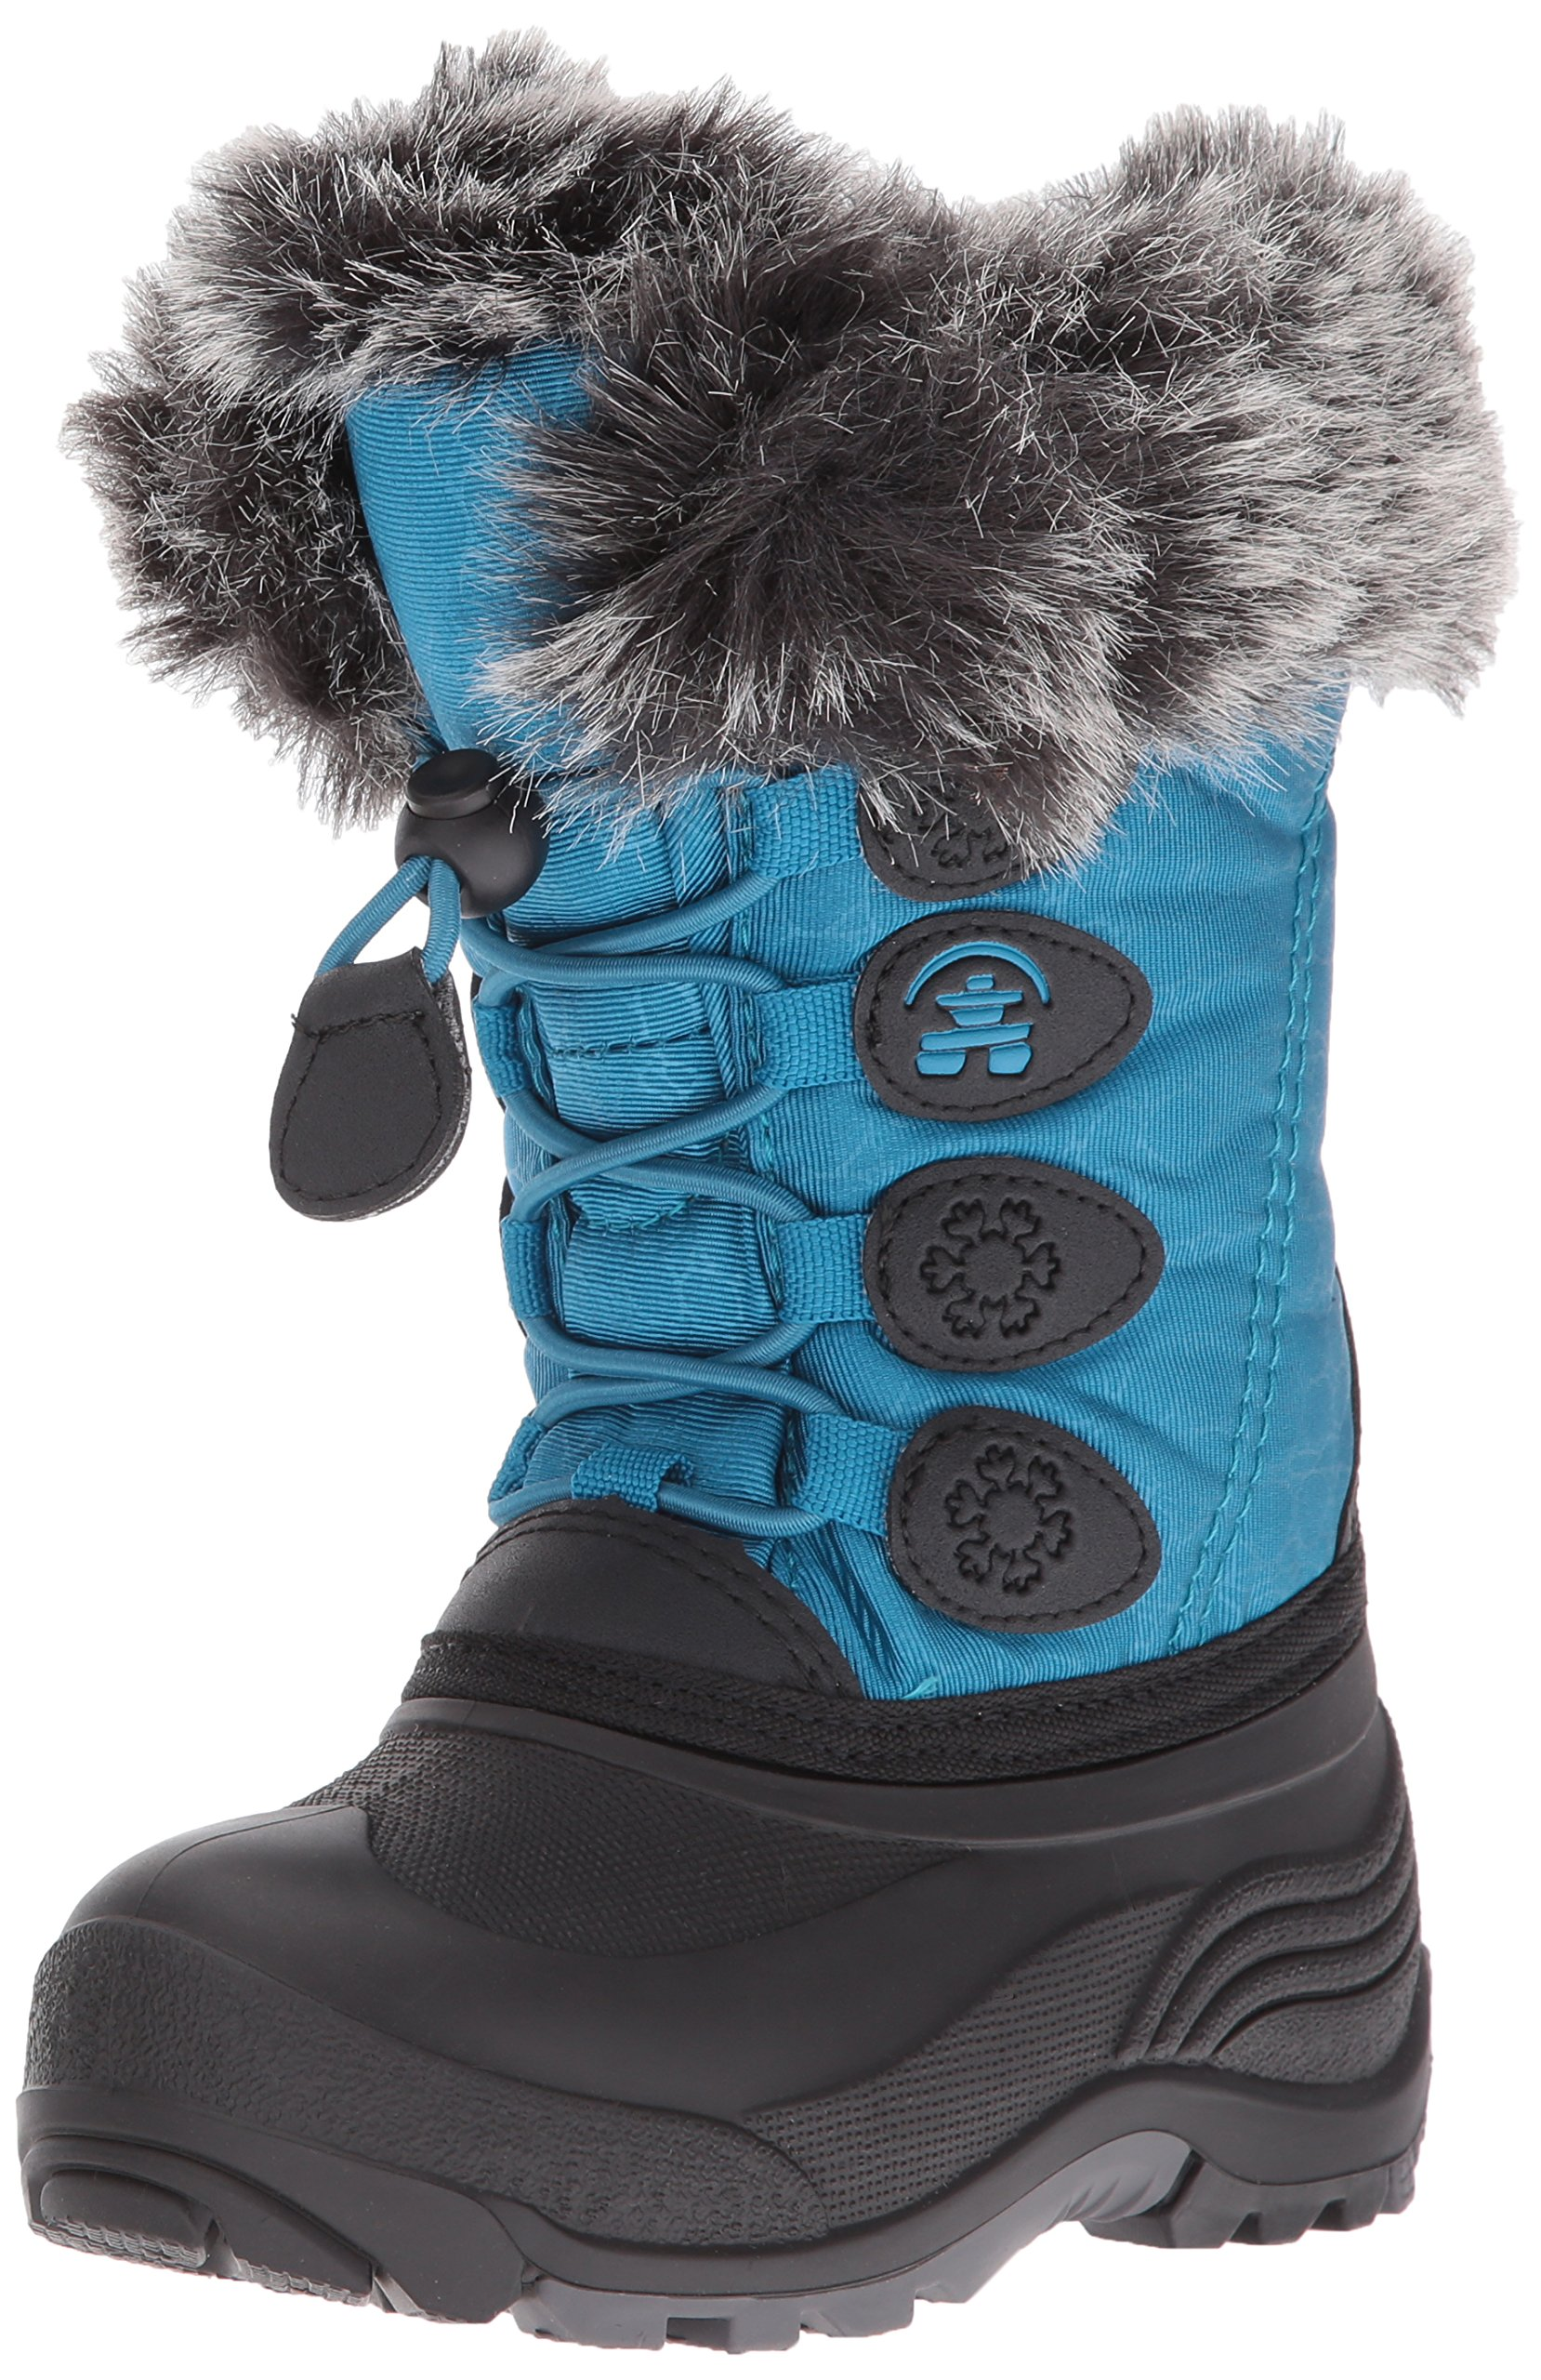 Kamik Kids' Snowgypsy Snow Boot, Teal, 8 Medium US Toddler